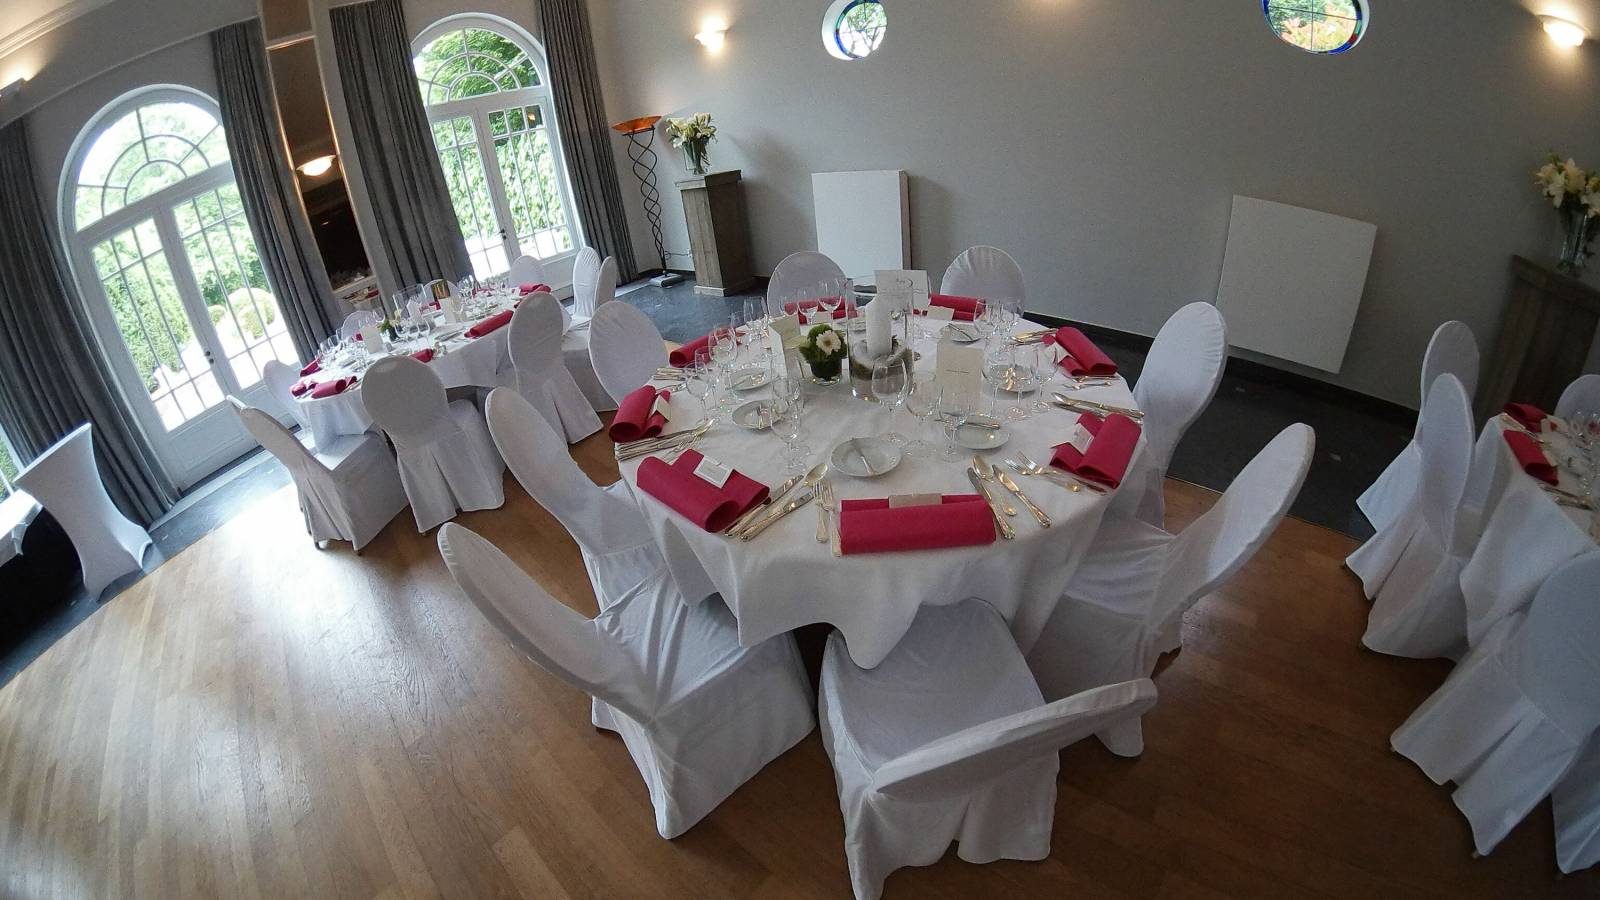 Zaal Orangerie Hof Van Reyen Boechout (15) - House of Weddings